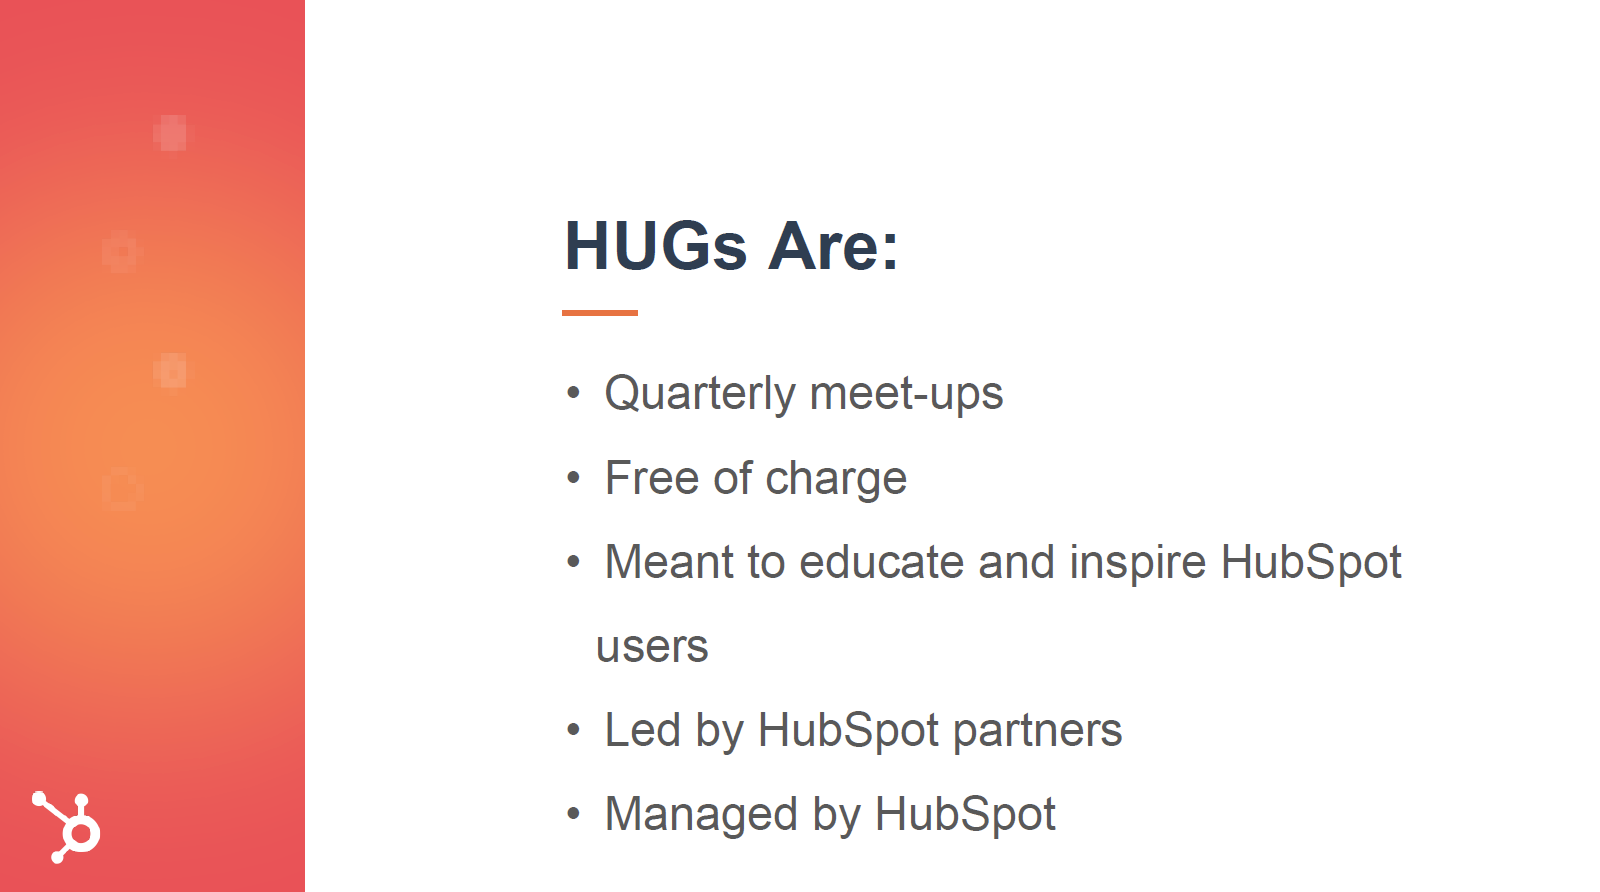 hug-hubpost